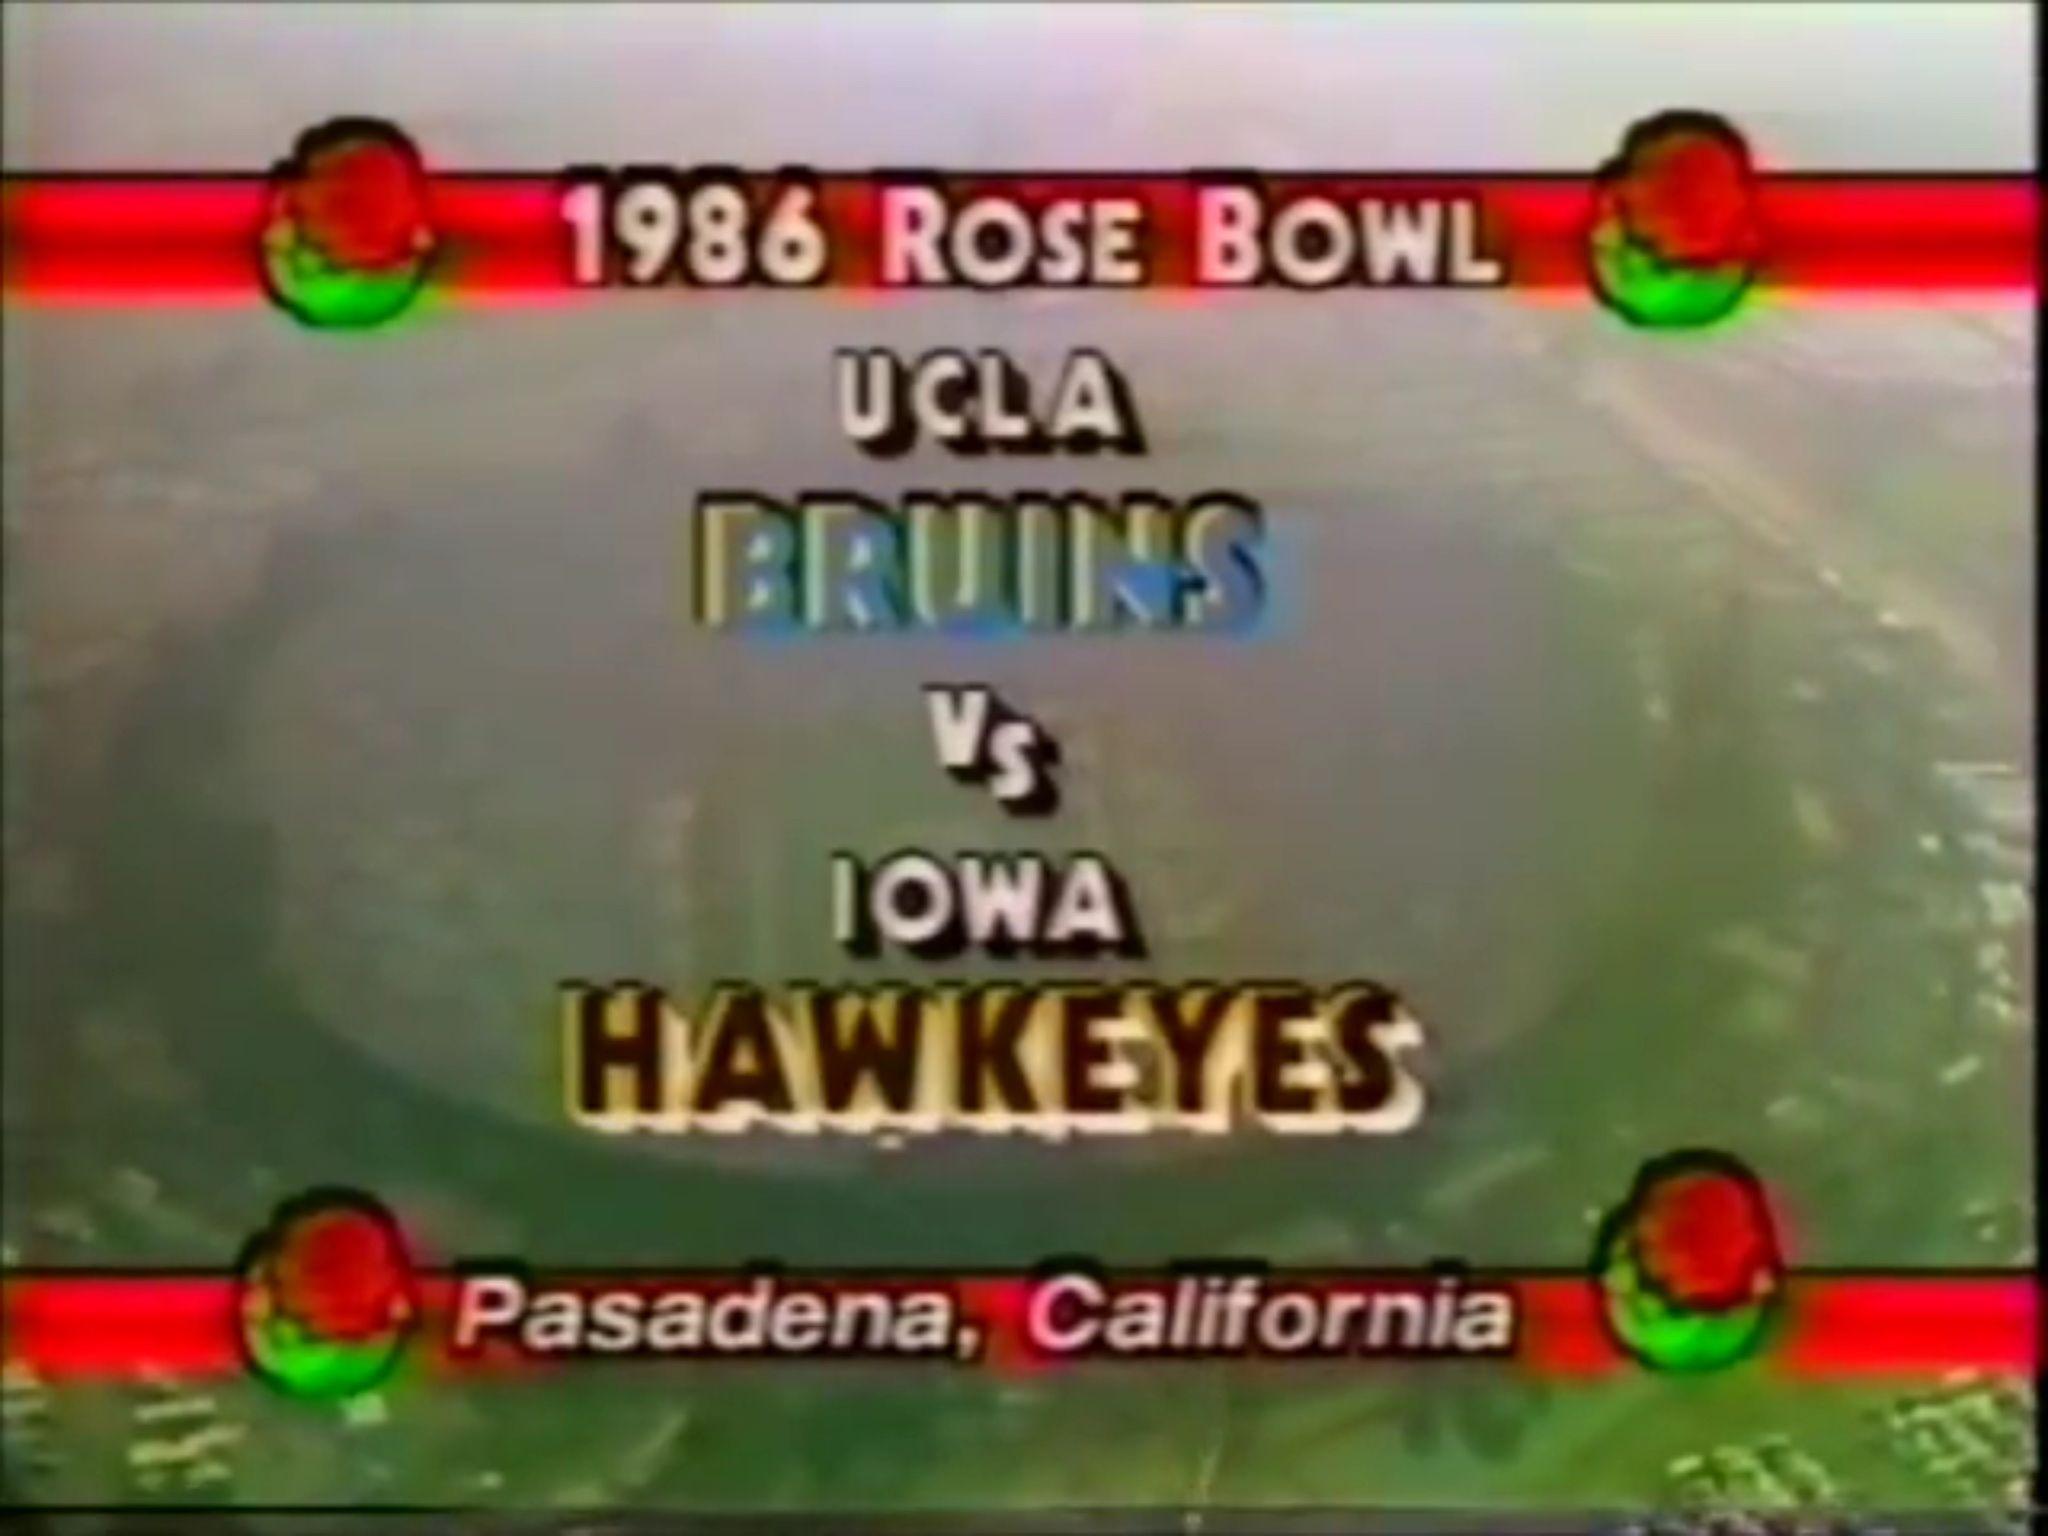 1986 Rose Bowl Rose bowl, Iowa hawkeyes, Iowa